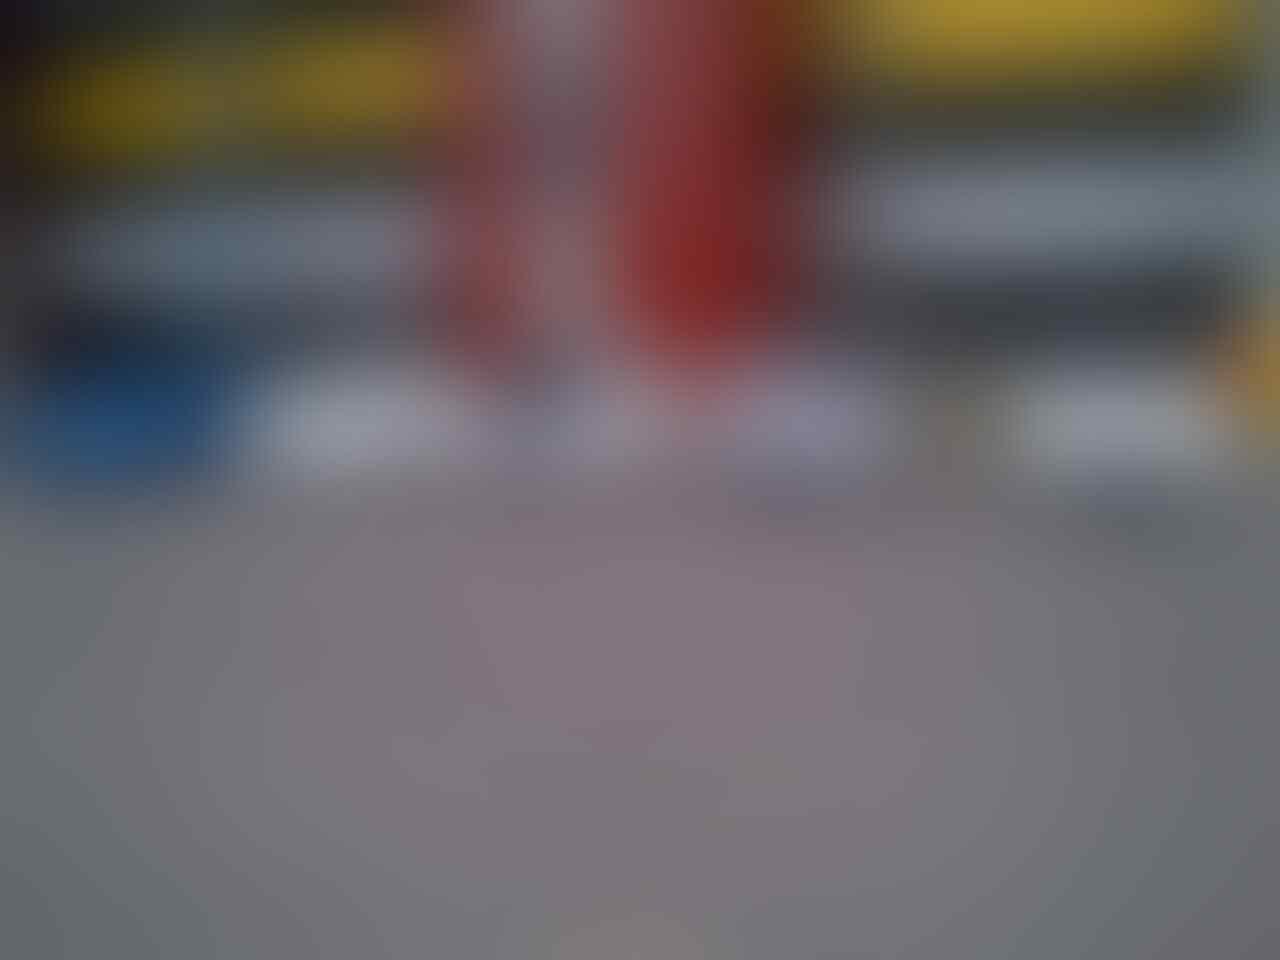 Toyota Etios Valco Club Indonesia [TEVCI] @Kaskus